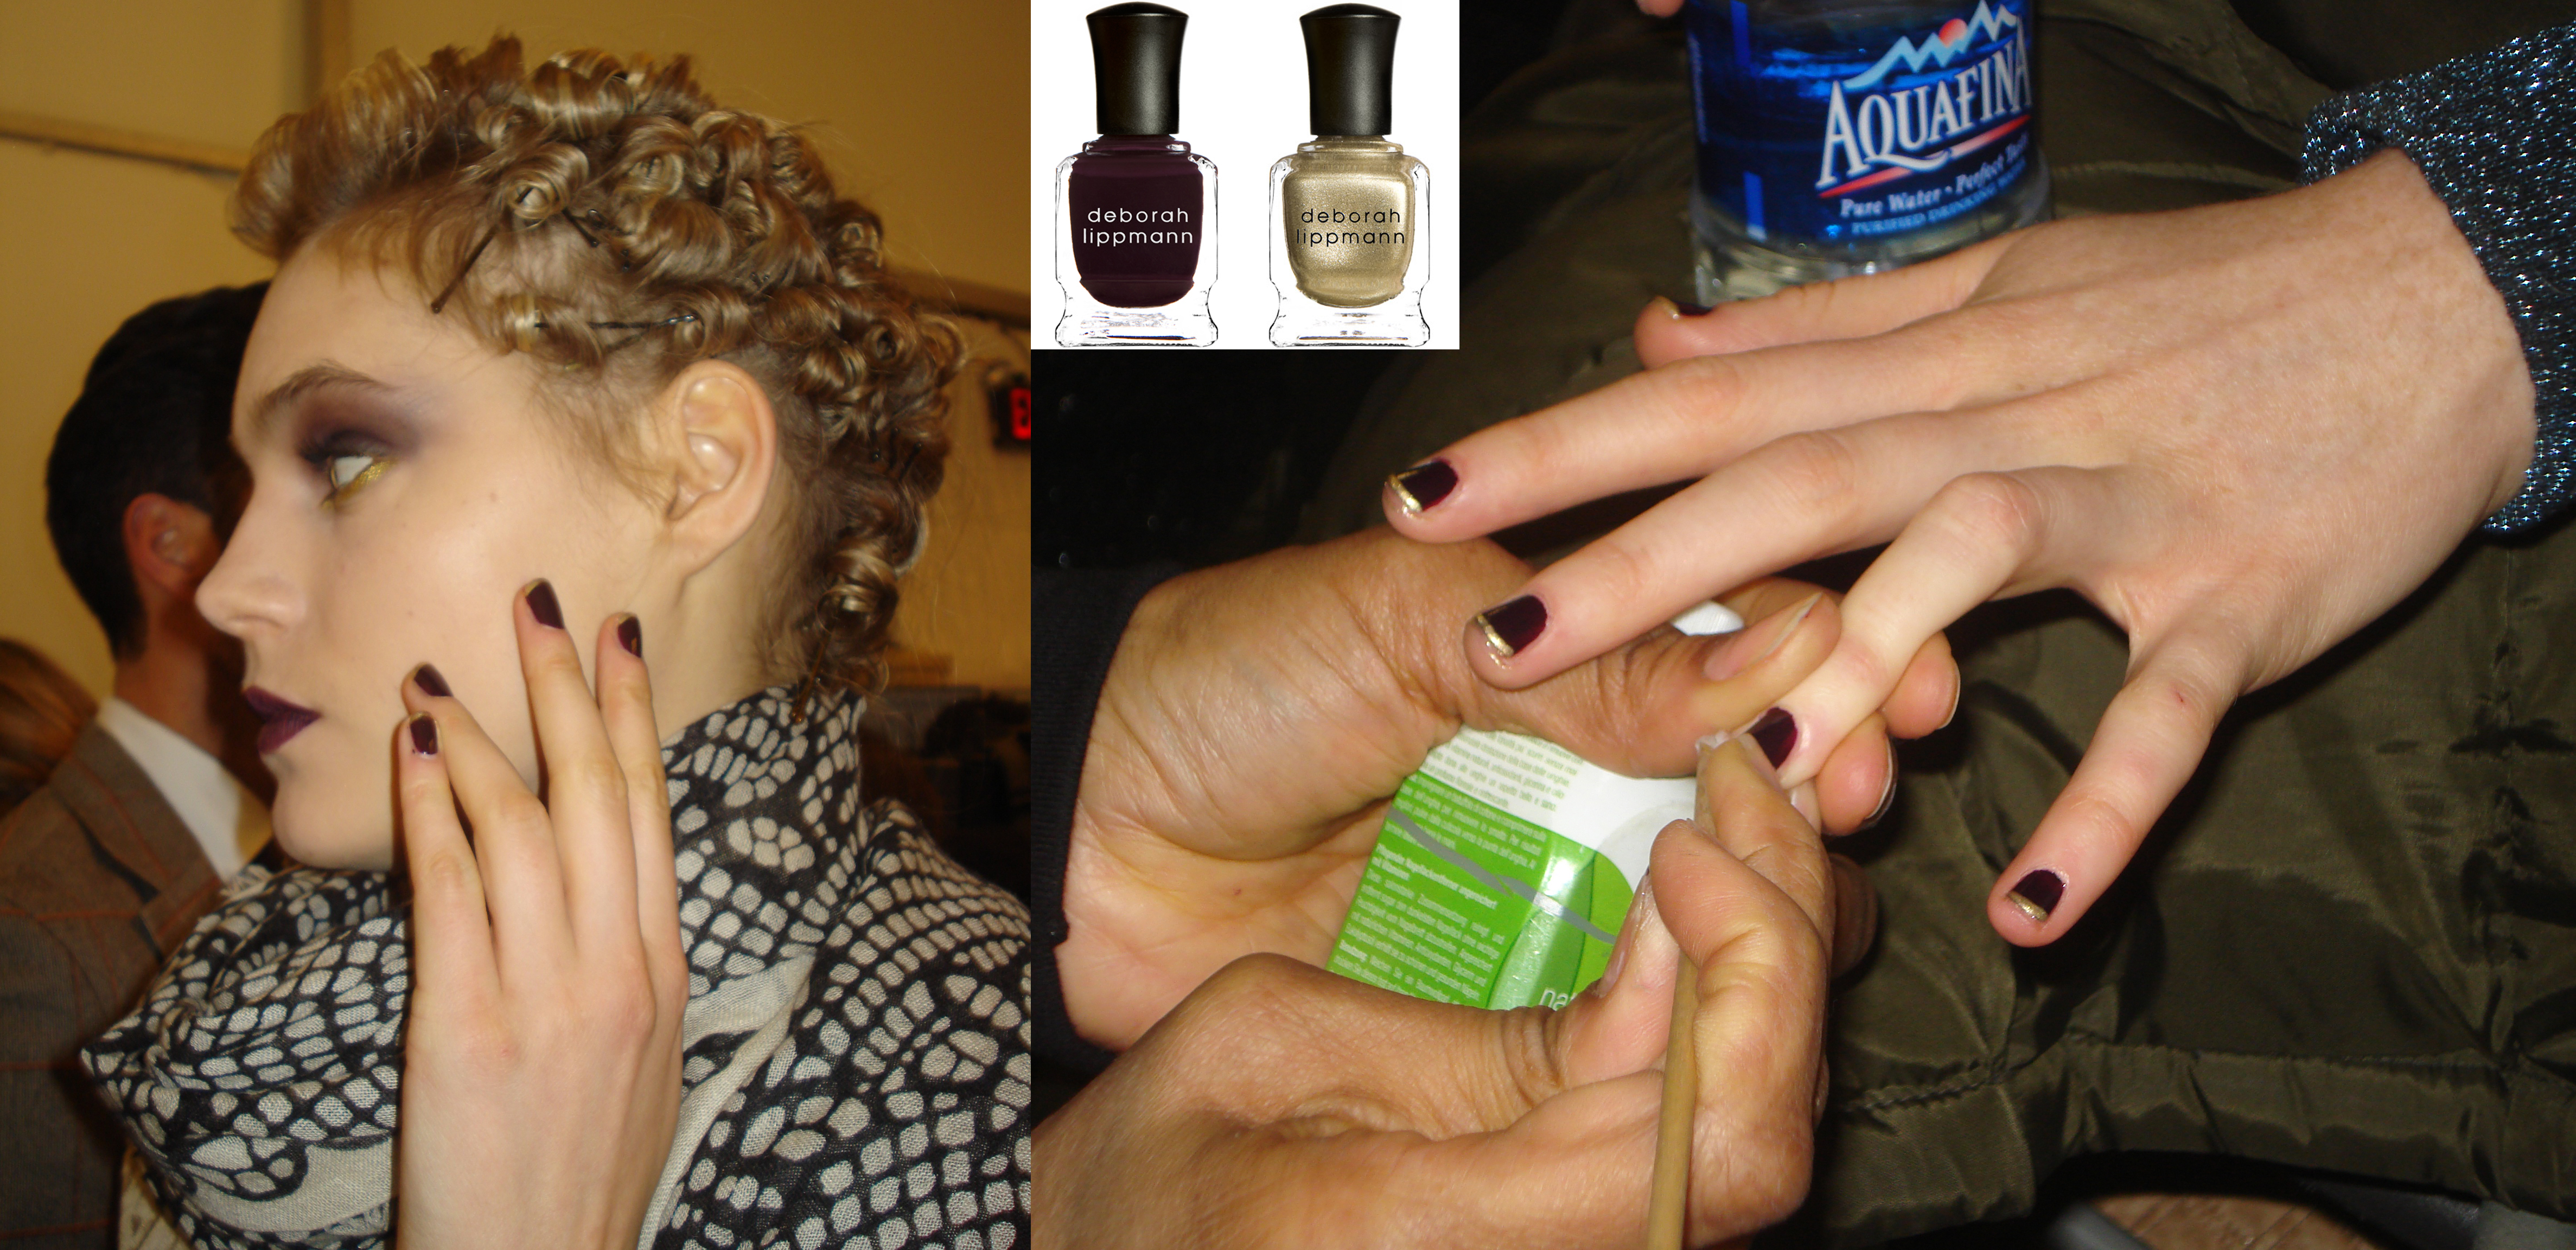 Updated French manicure by Deborah Lippmann